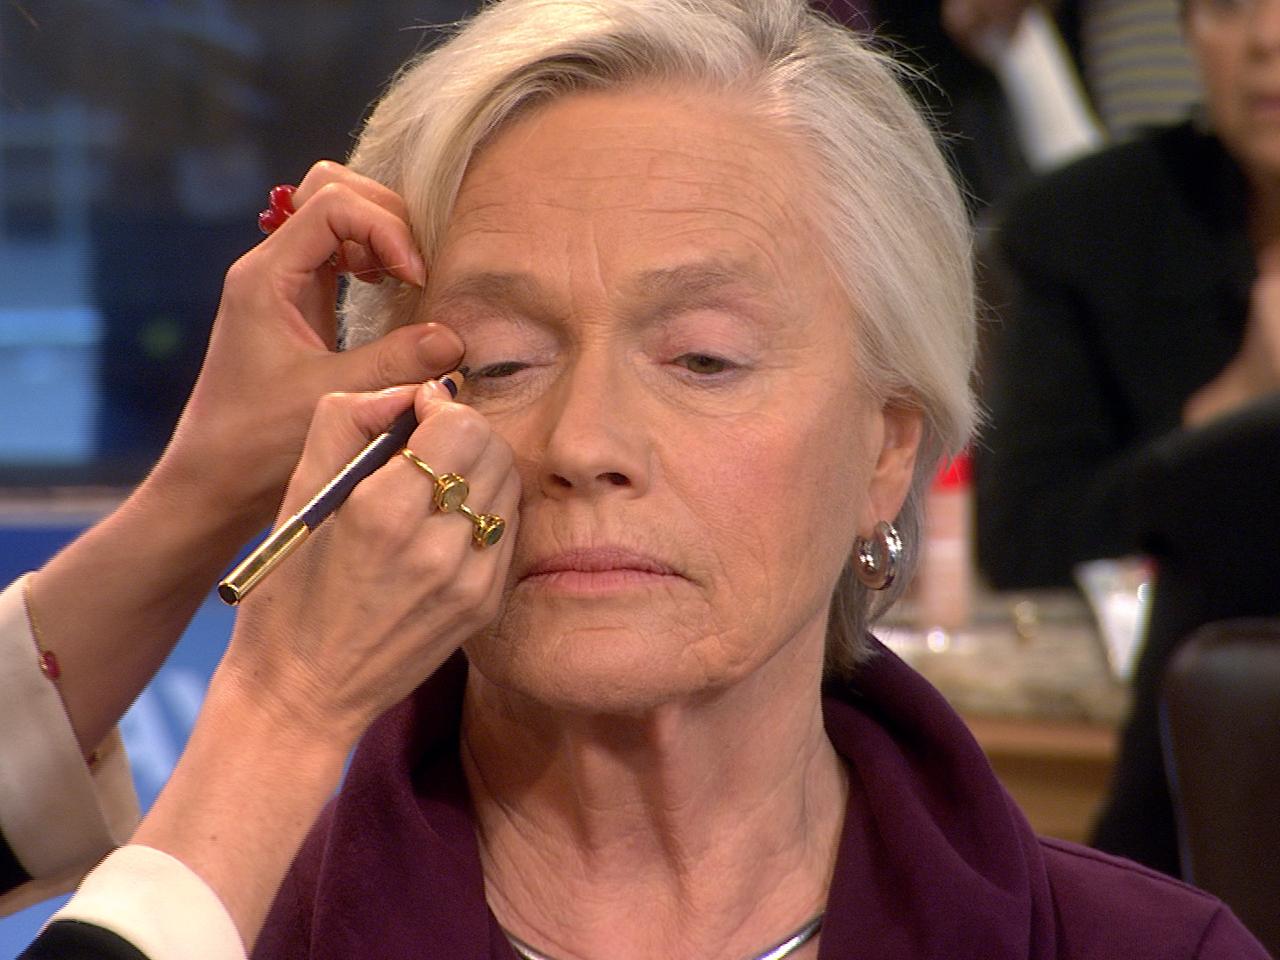 Glam-mas: Makeup tutorial for seniors goes viral